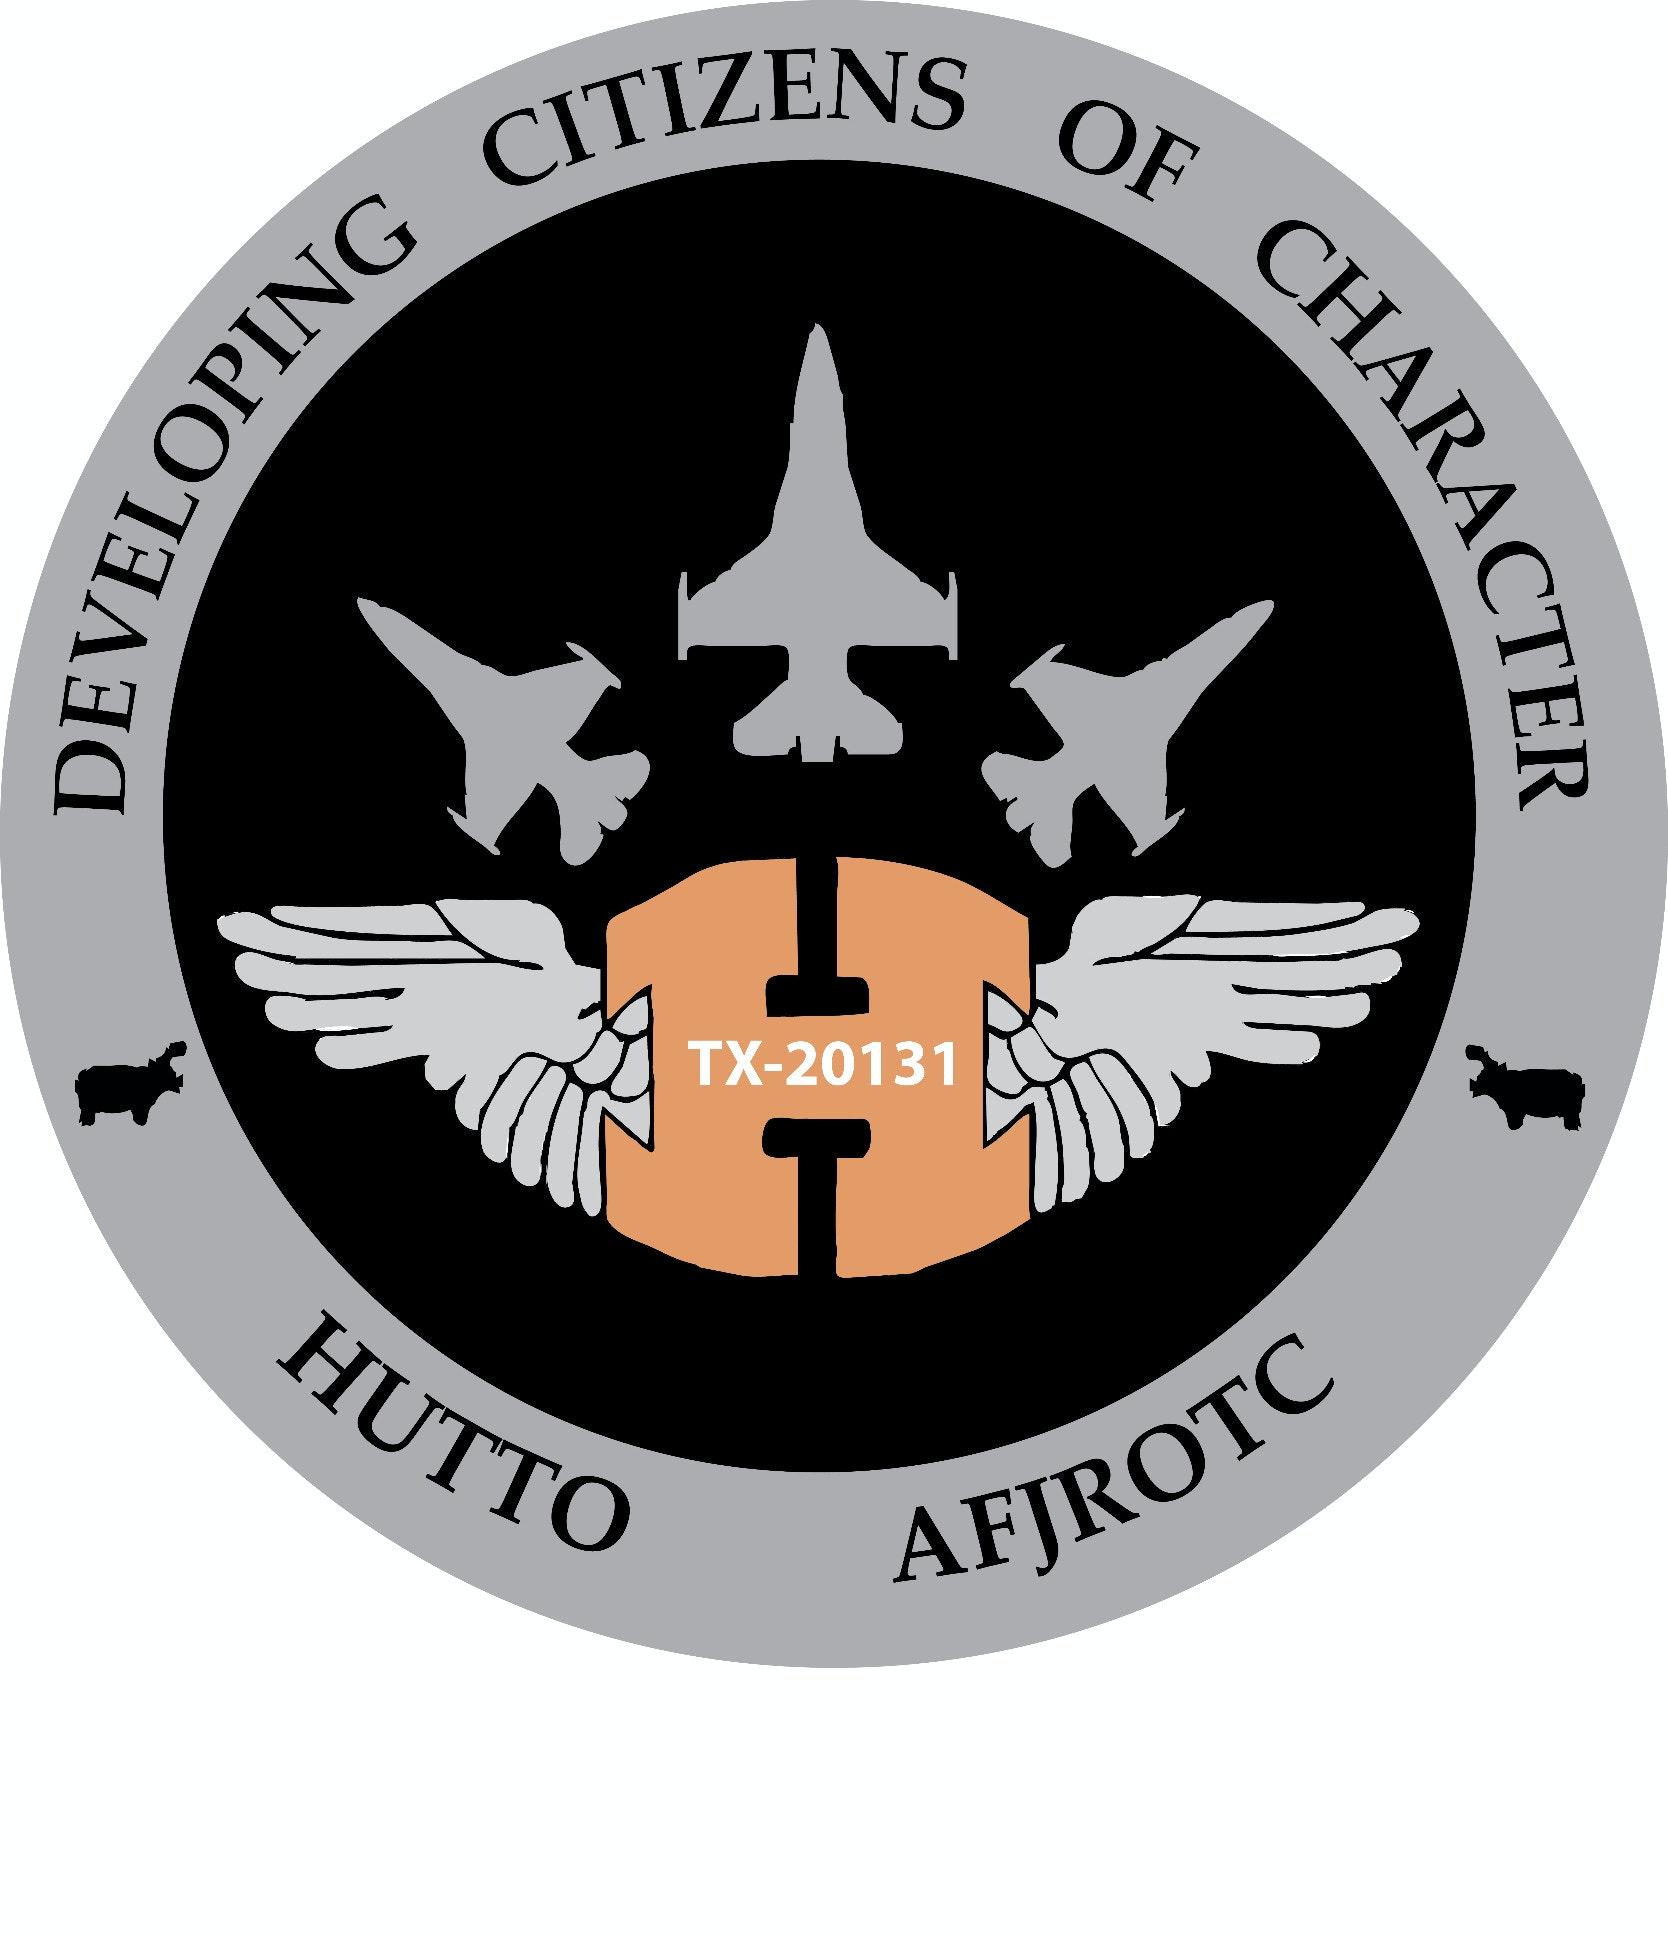 Hutto AF JROTC Parent Group